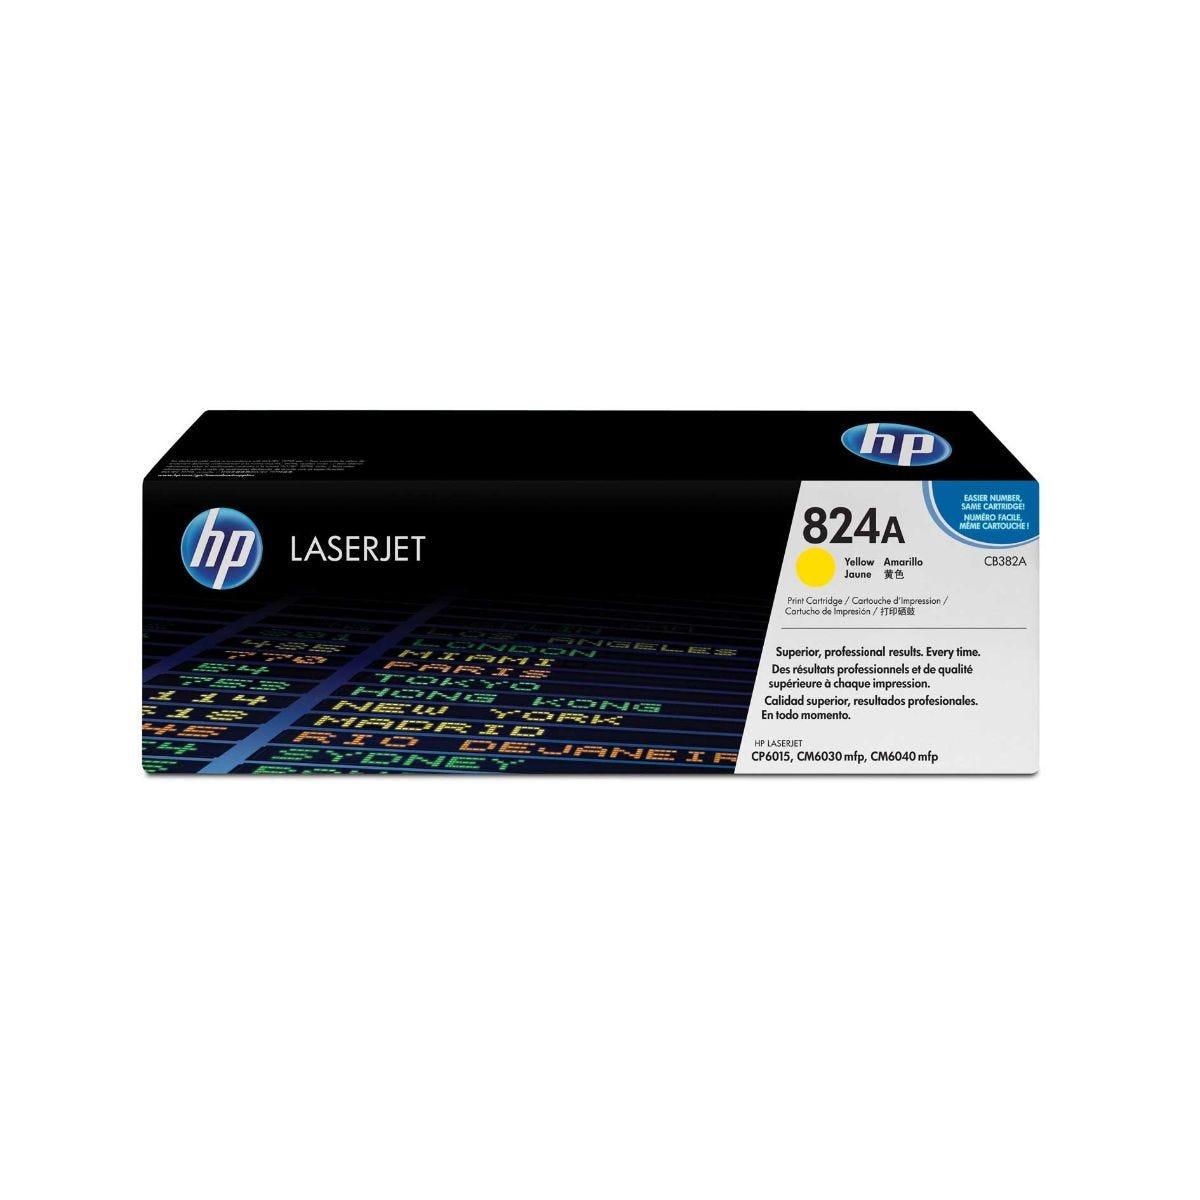 HP 824A Laserjet Printer Ink Toner Cartridge CB382A, Yellow